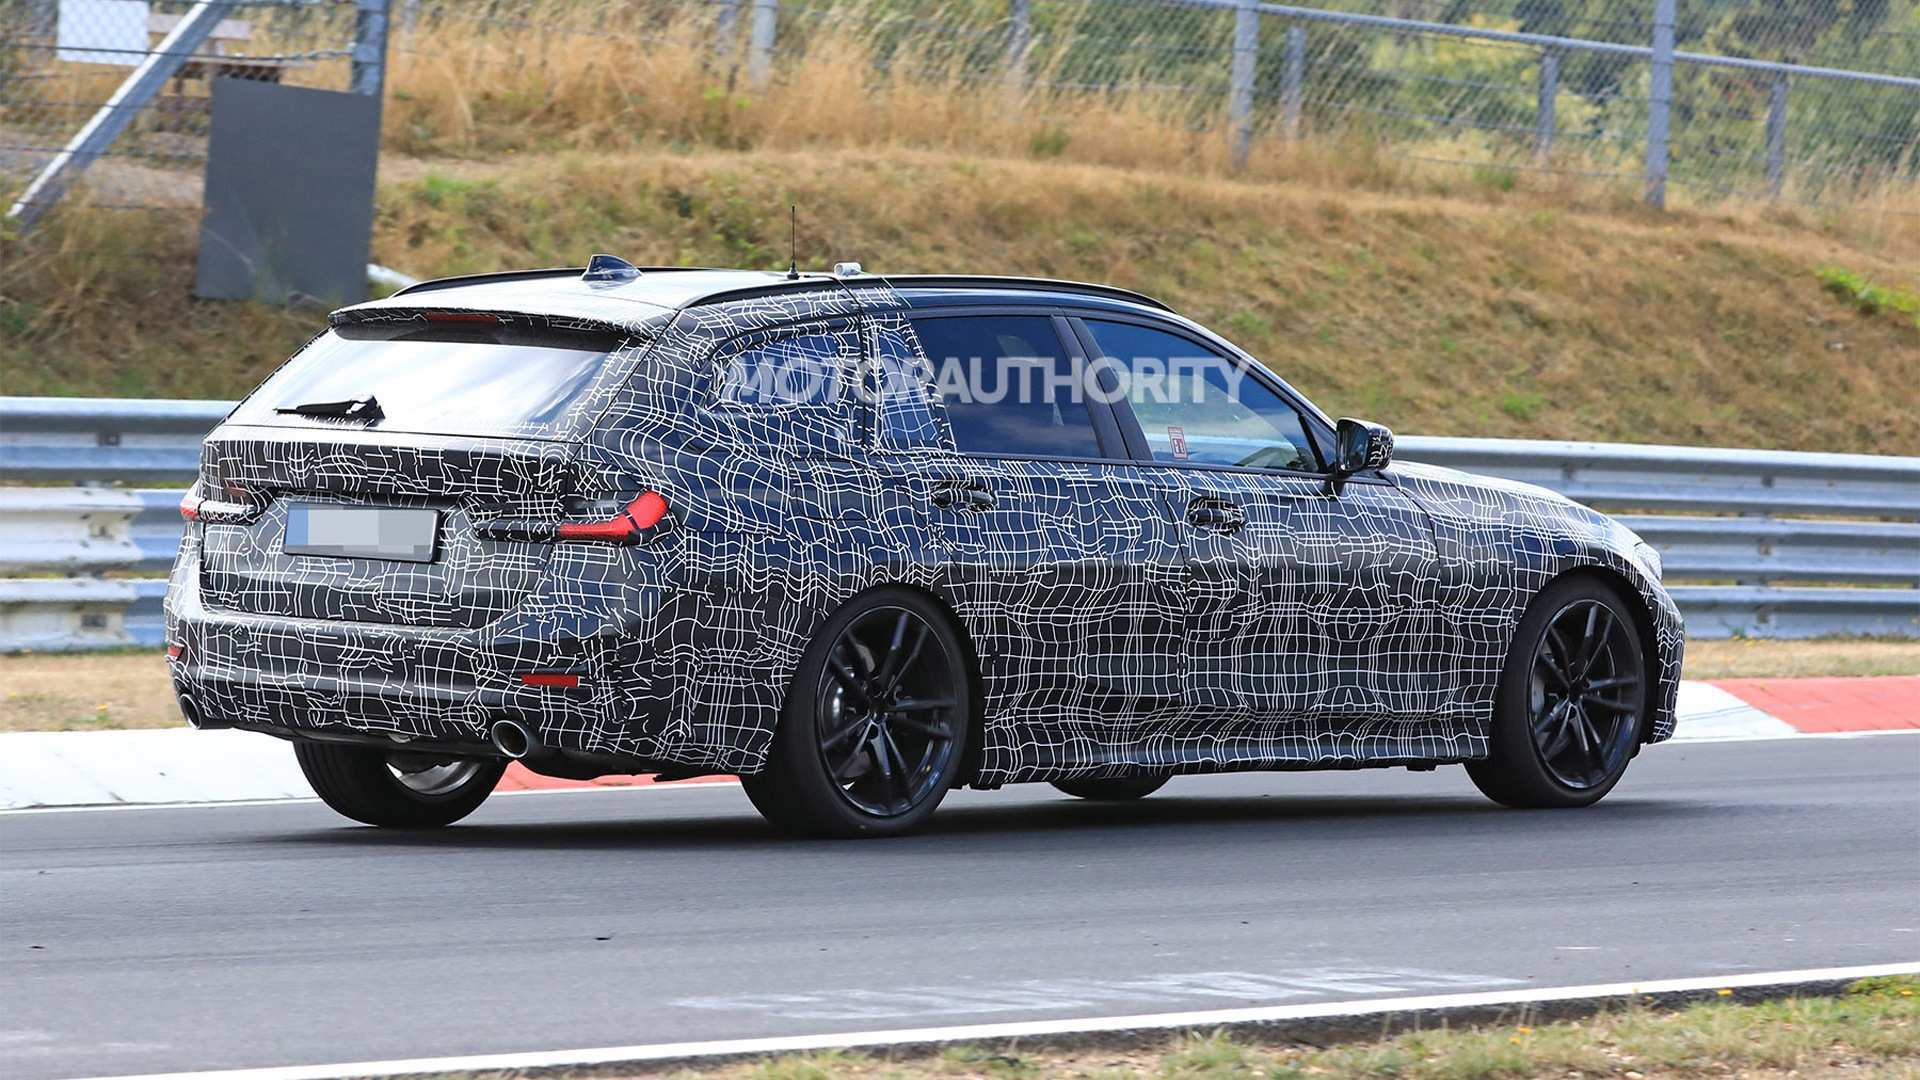 40 Gallery of Spy Shots 2020 BMW 3 Series Rumors with Spy Shots 2020 BMW 3 Series